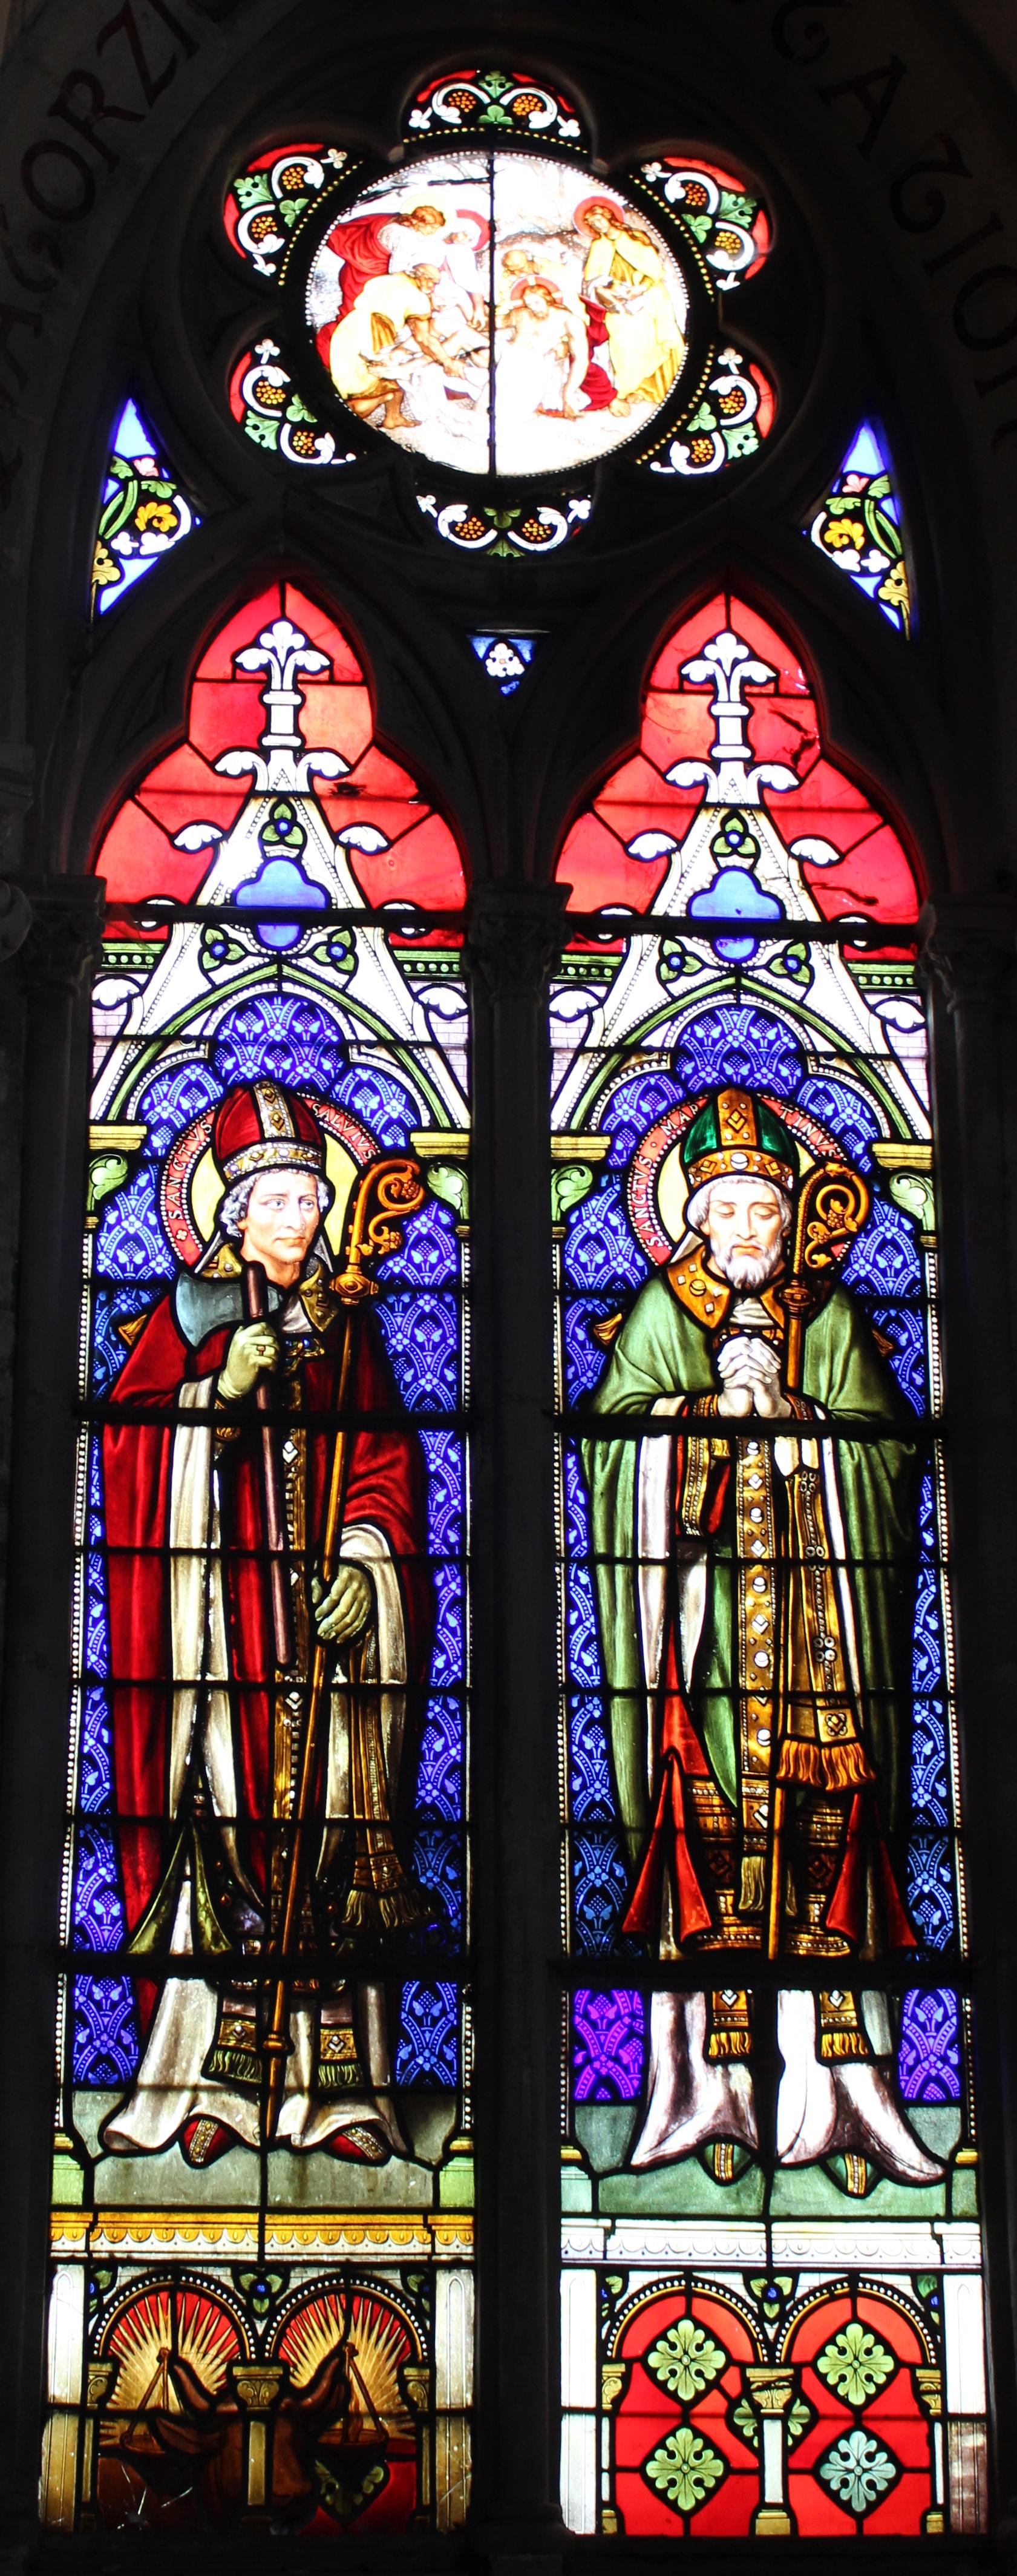 Saint Saulve et St Martin